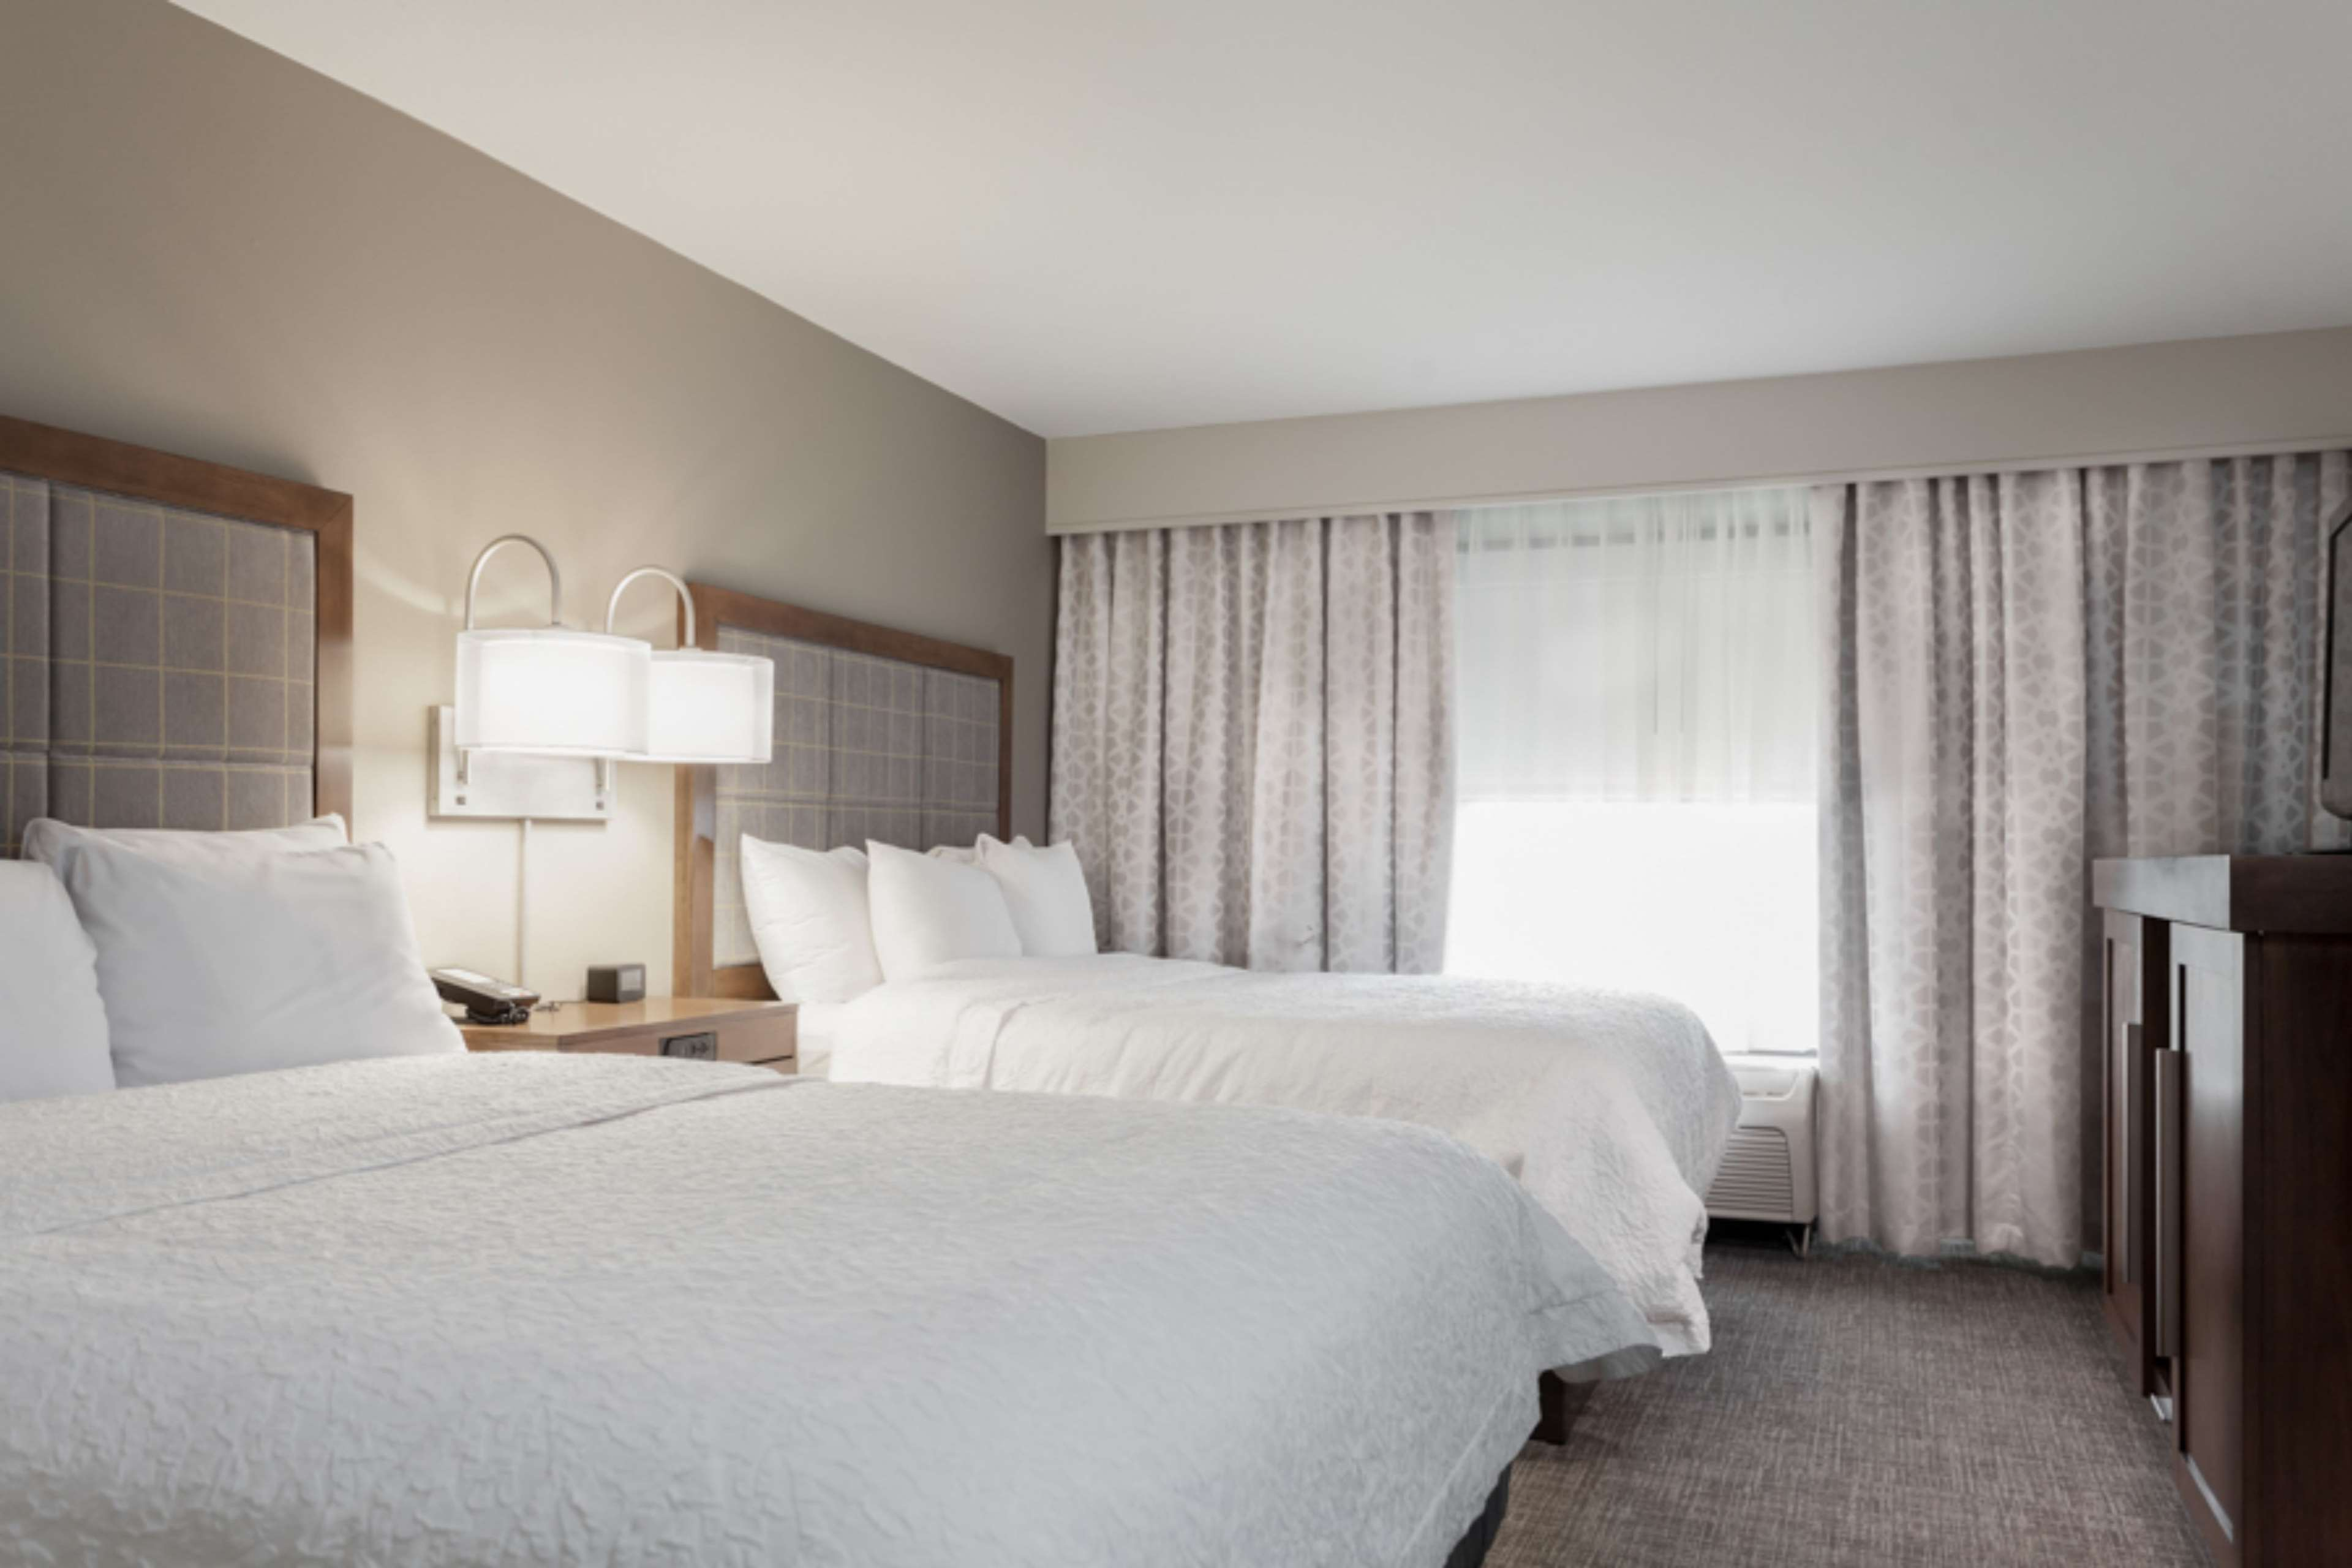 Hampton Inn & Suites Dallas-DFW Airport North-Grapevine image 16